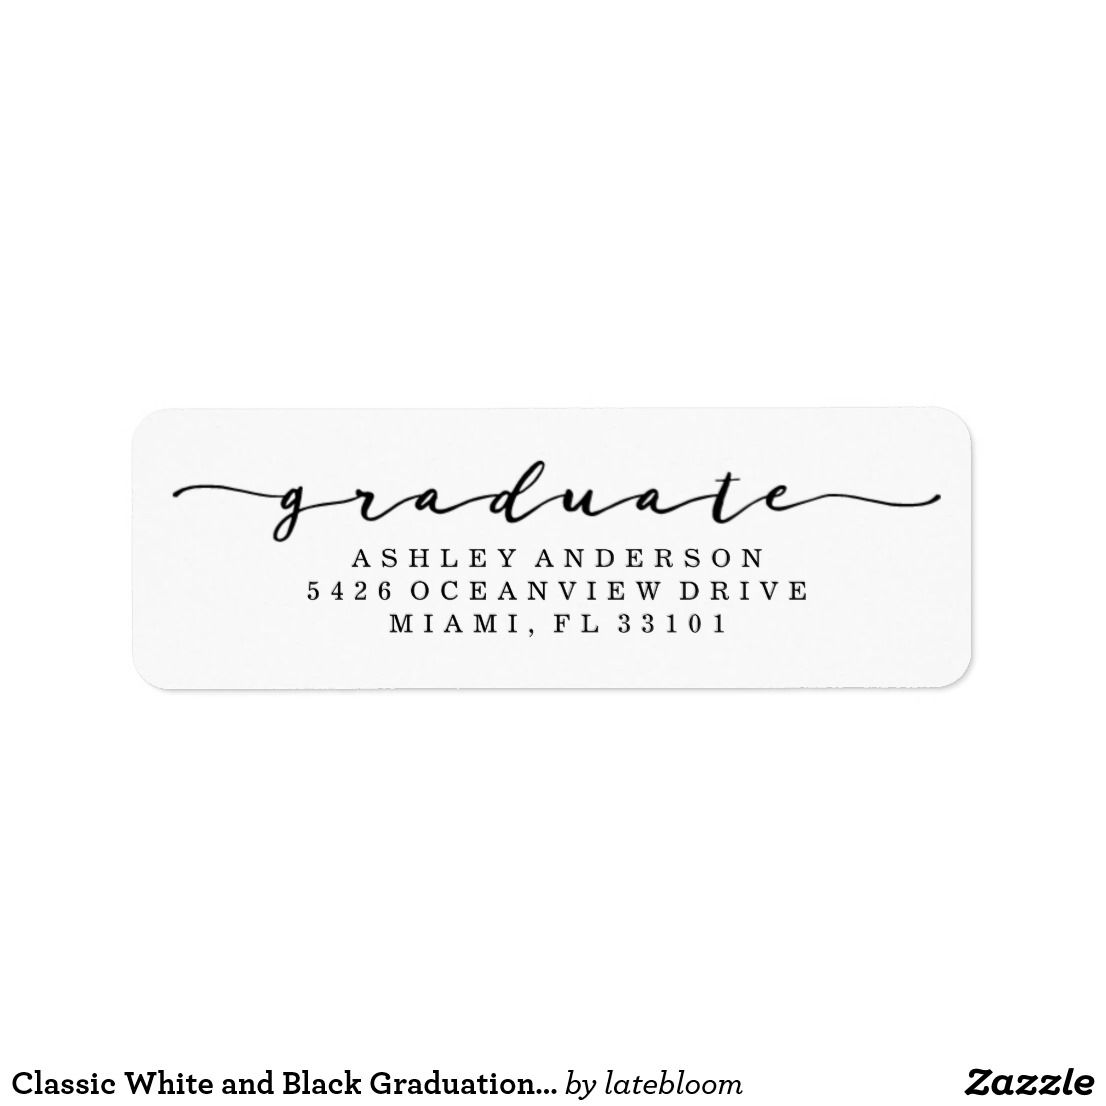 Classic White And Black Graduation Address Labels Zazzle Com Address Labels Microsoft Word Templates Classic White Graduation return address labels templates